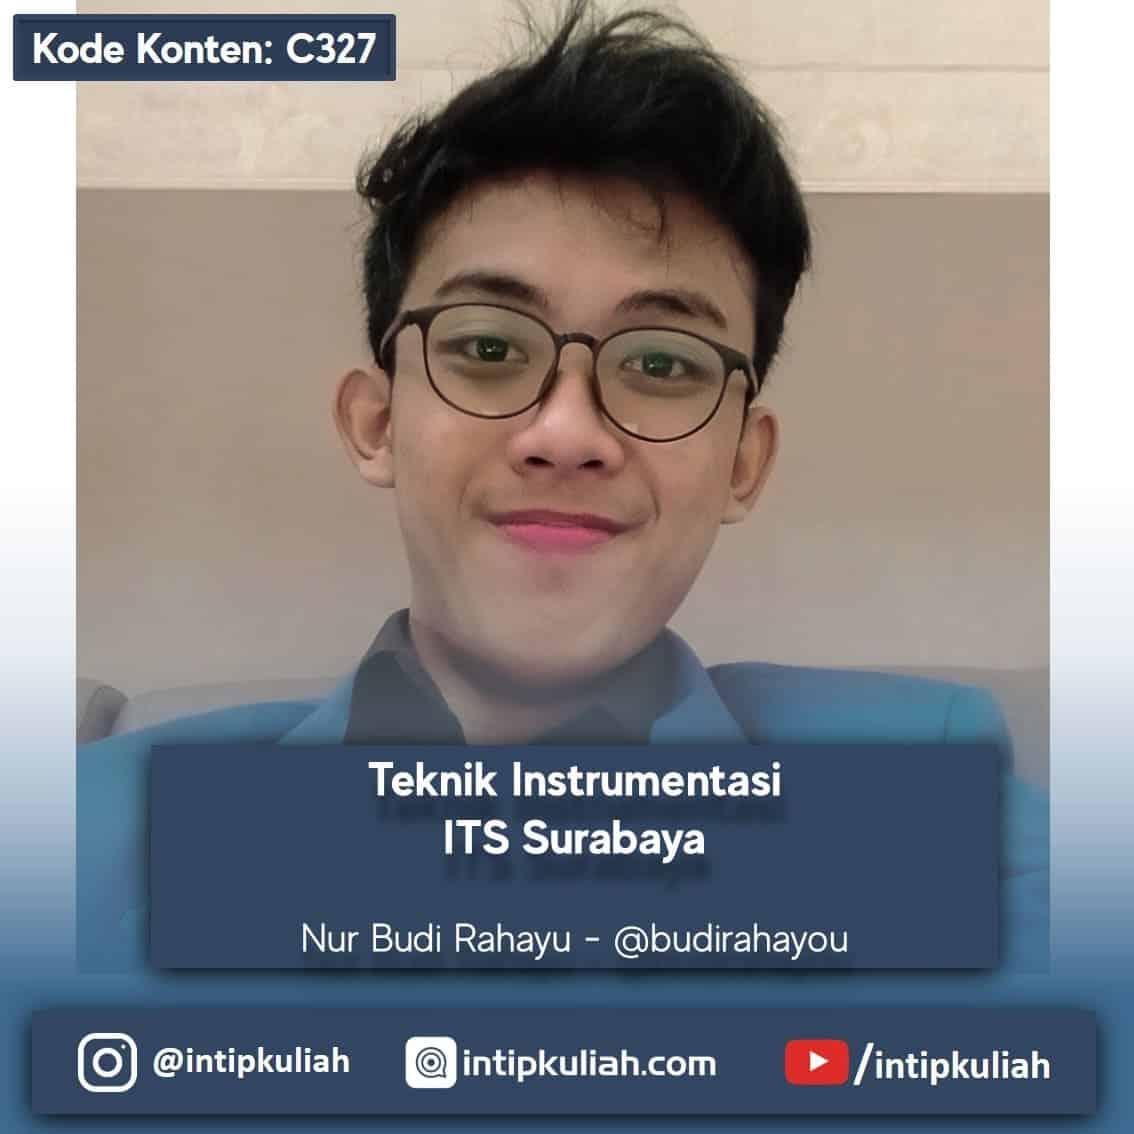 Teknik Instrumentasi ITS Surabaya (Budi)